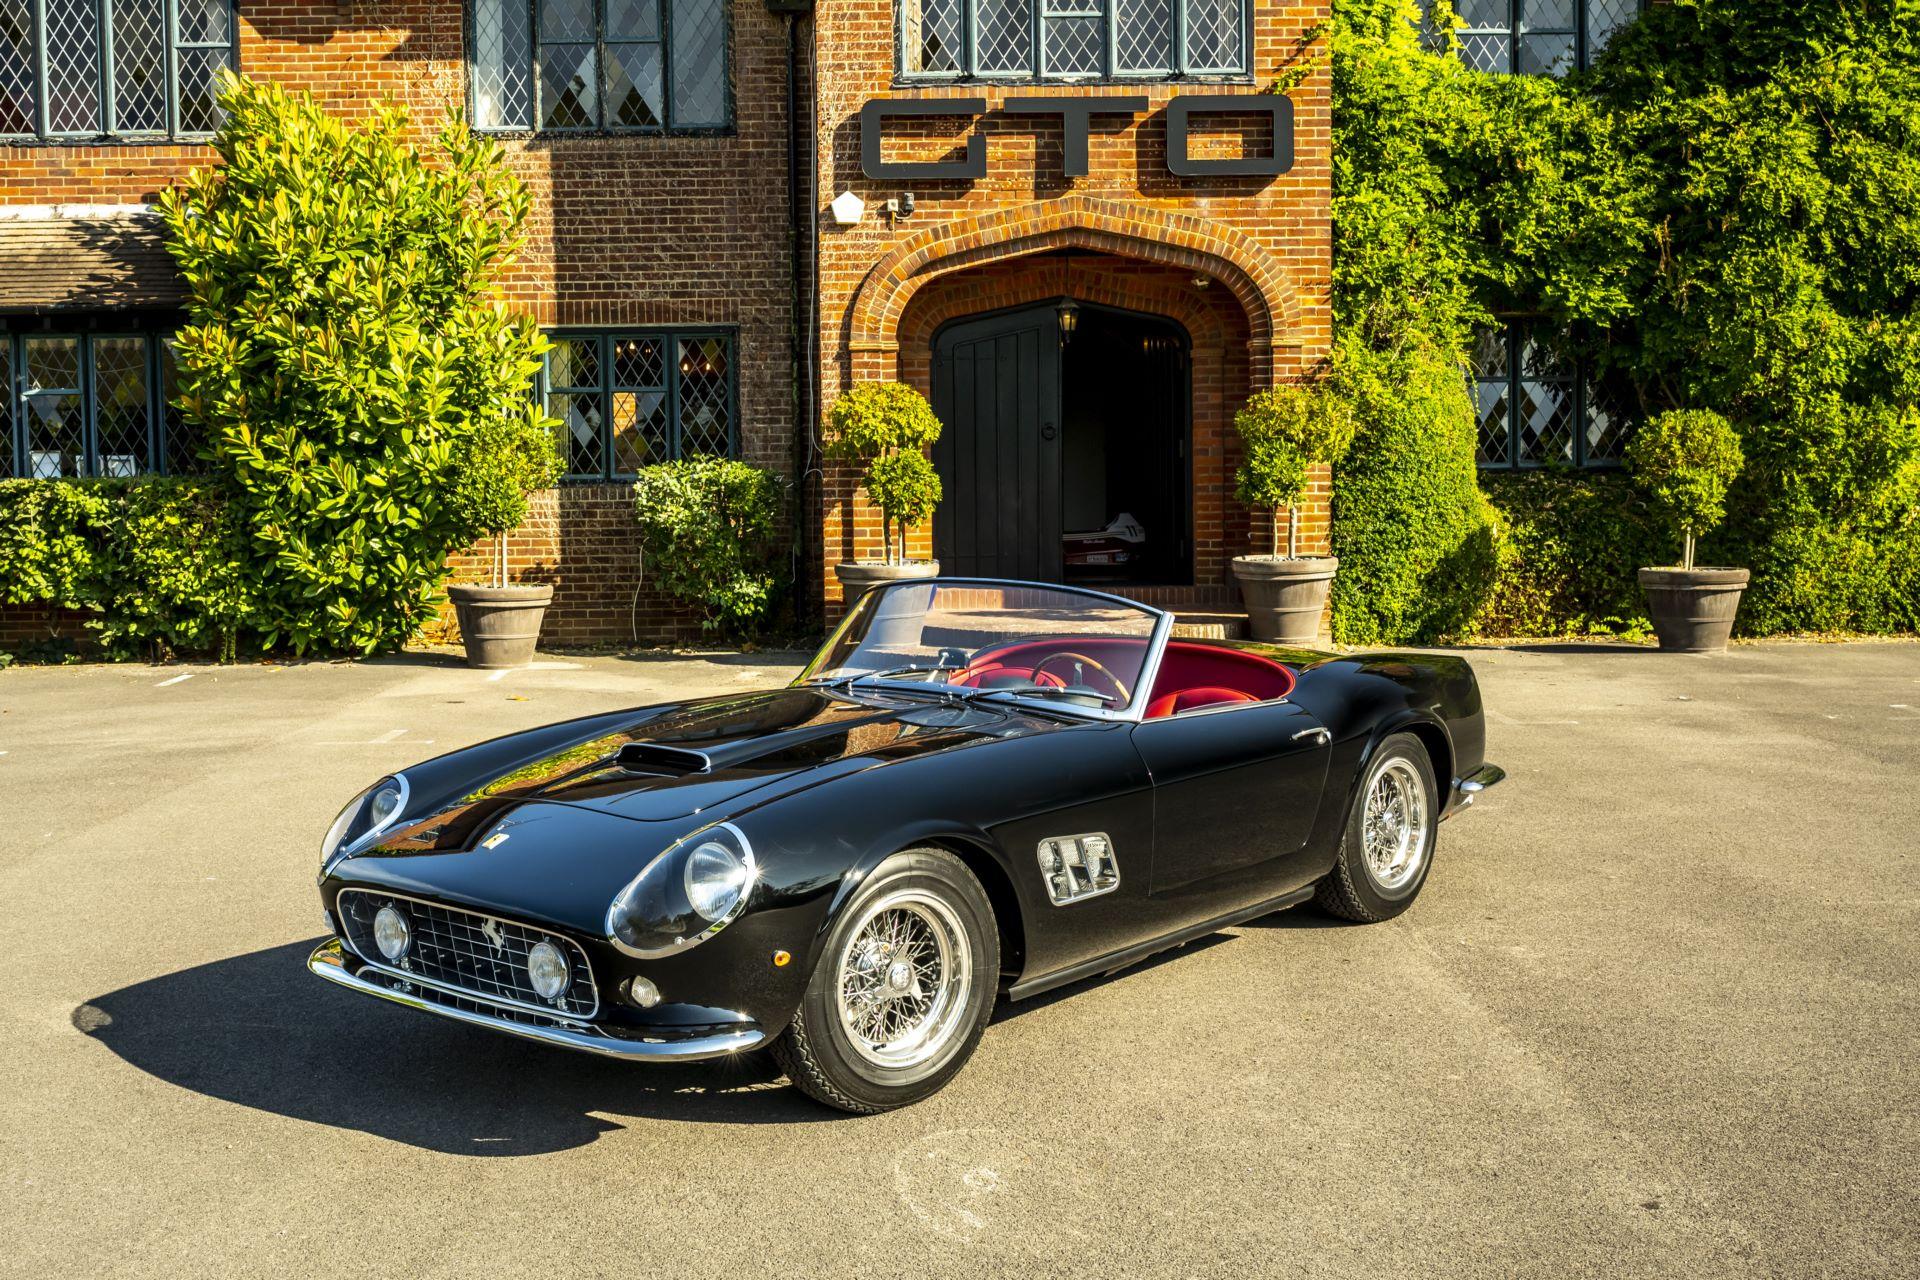 Ferrari-California-Spyder-by-GTO-Engineering-10